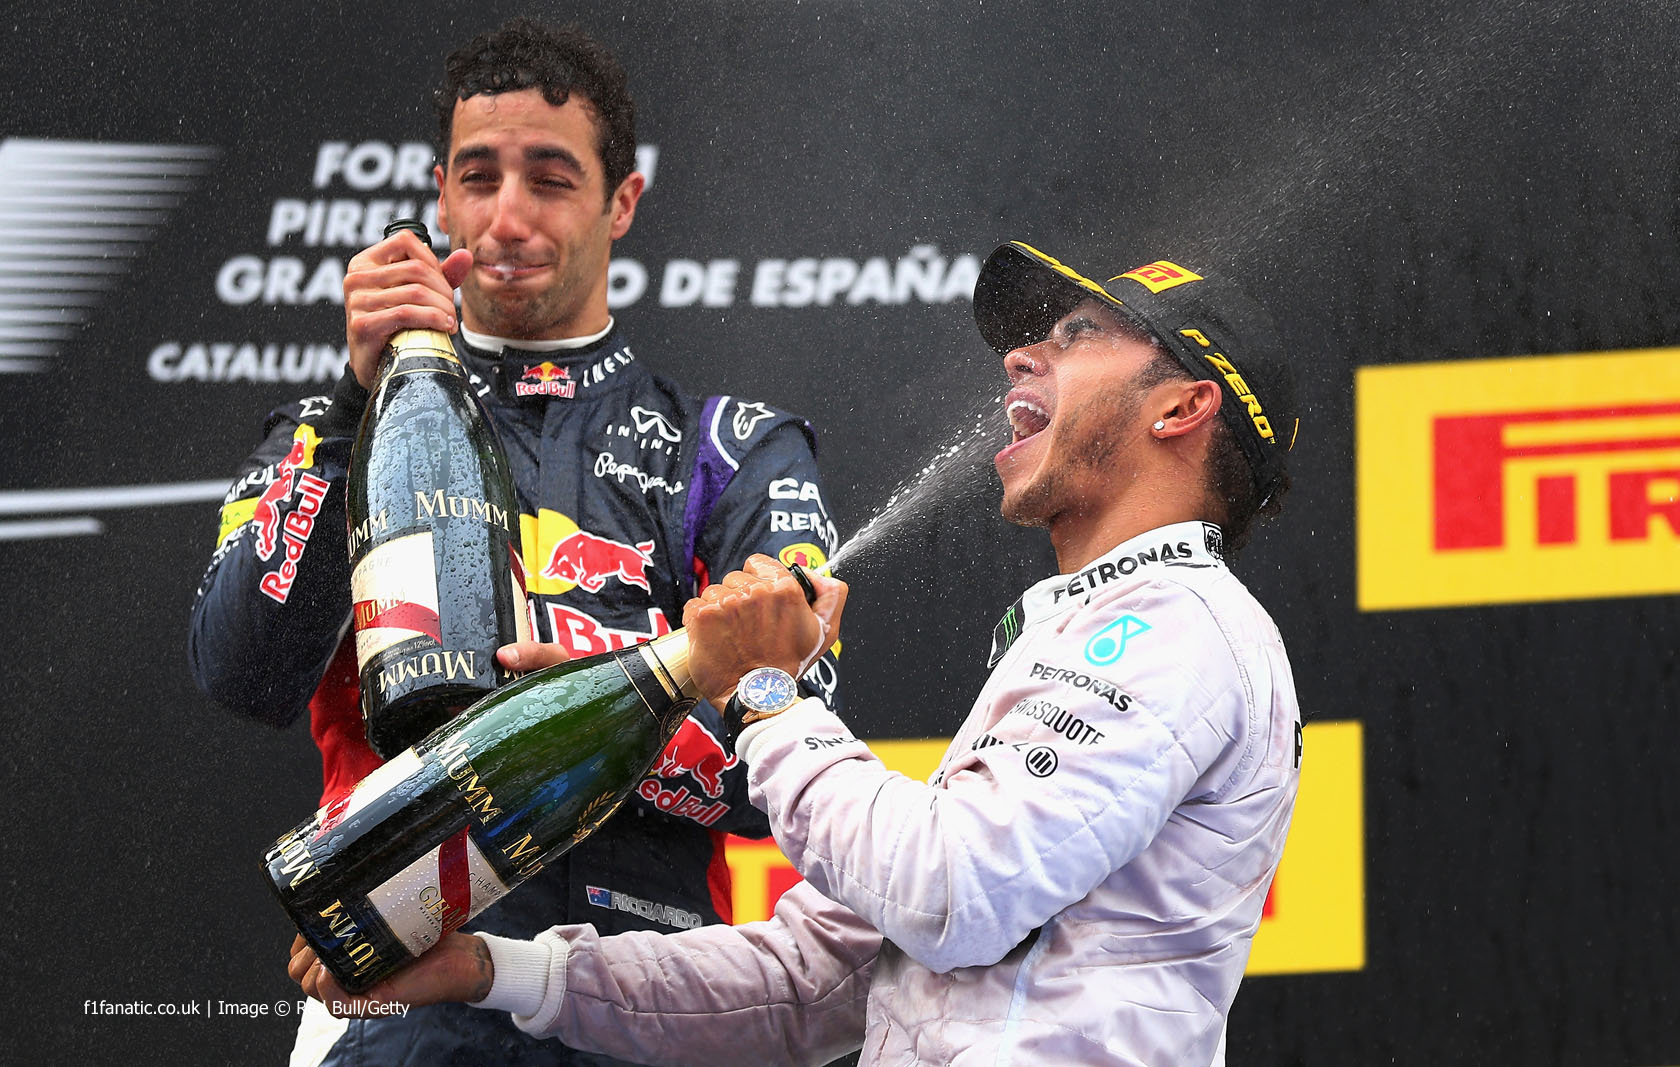 Daniel Ricciardo, Lewis Hamilton, Circuit de Catalunya, 2014